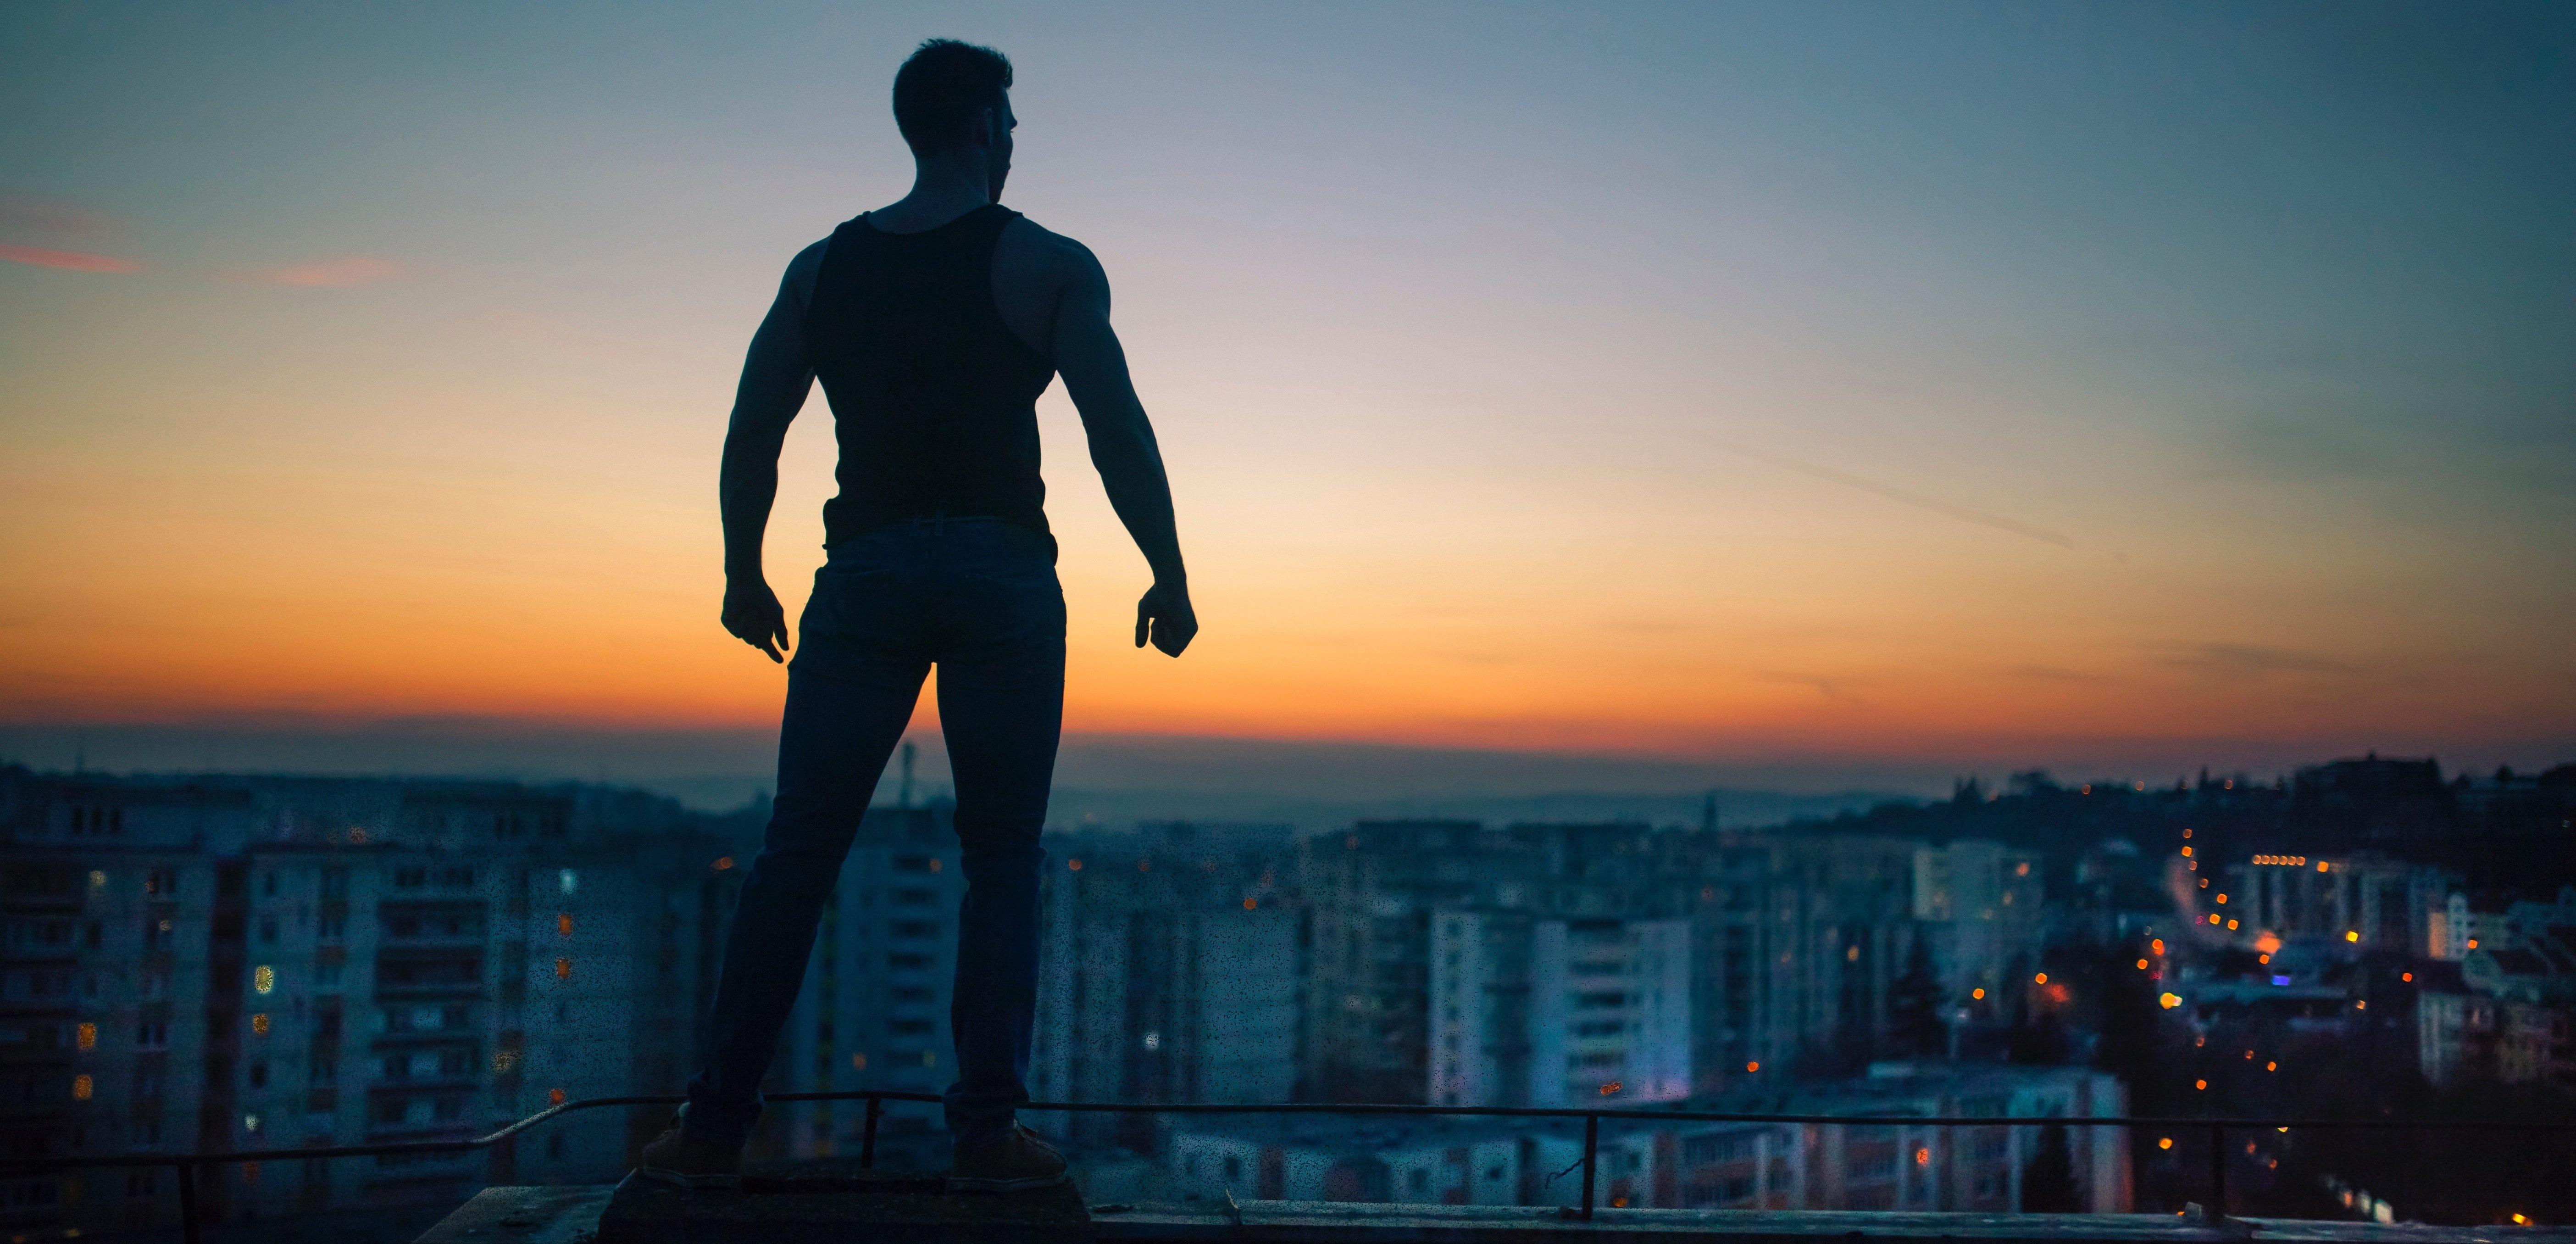 superhero overlooking a city at sunset